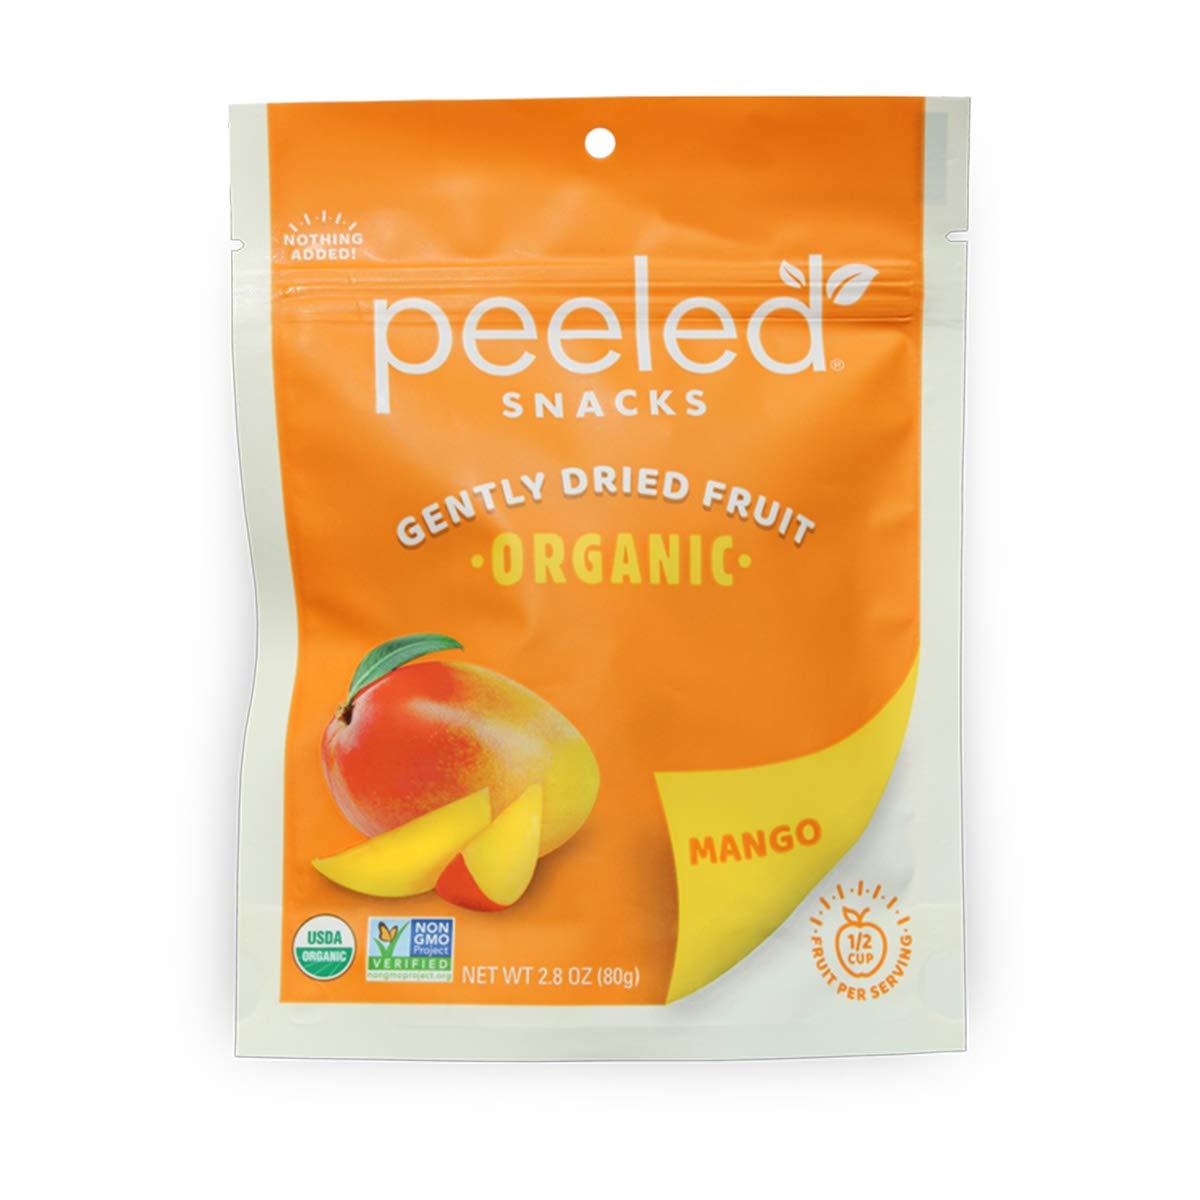 Peeled Snacks Organic Dried Fruit, Mango, 2.8 Ounce (Pack Of 12) by Peeled Snacks